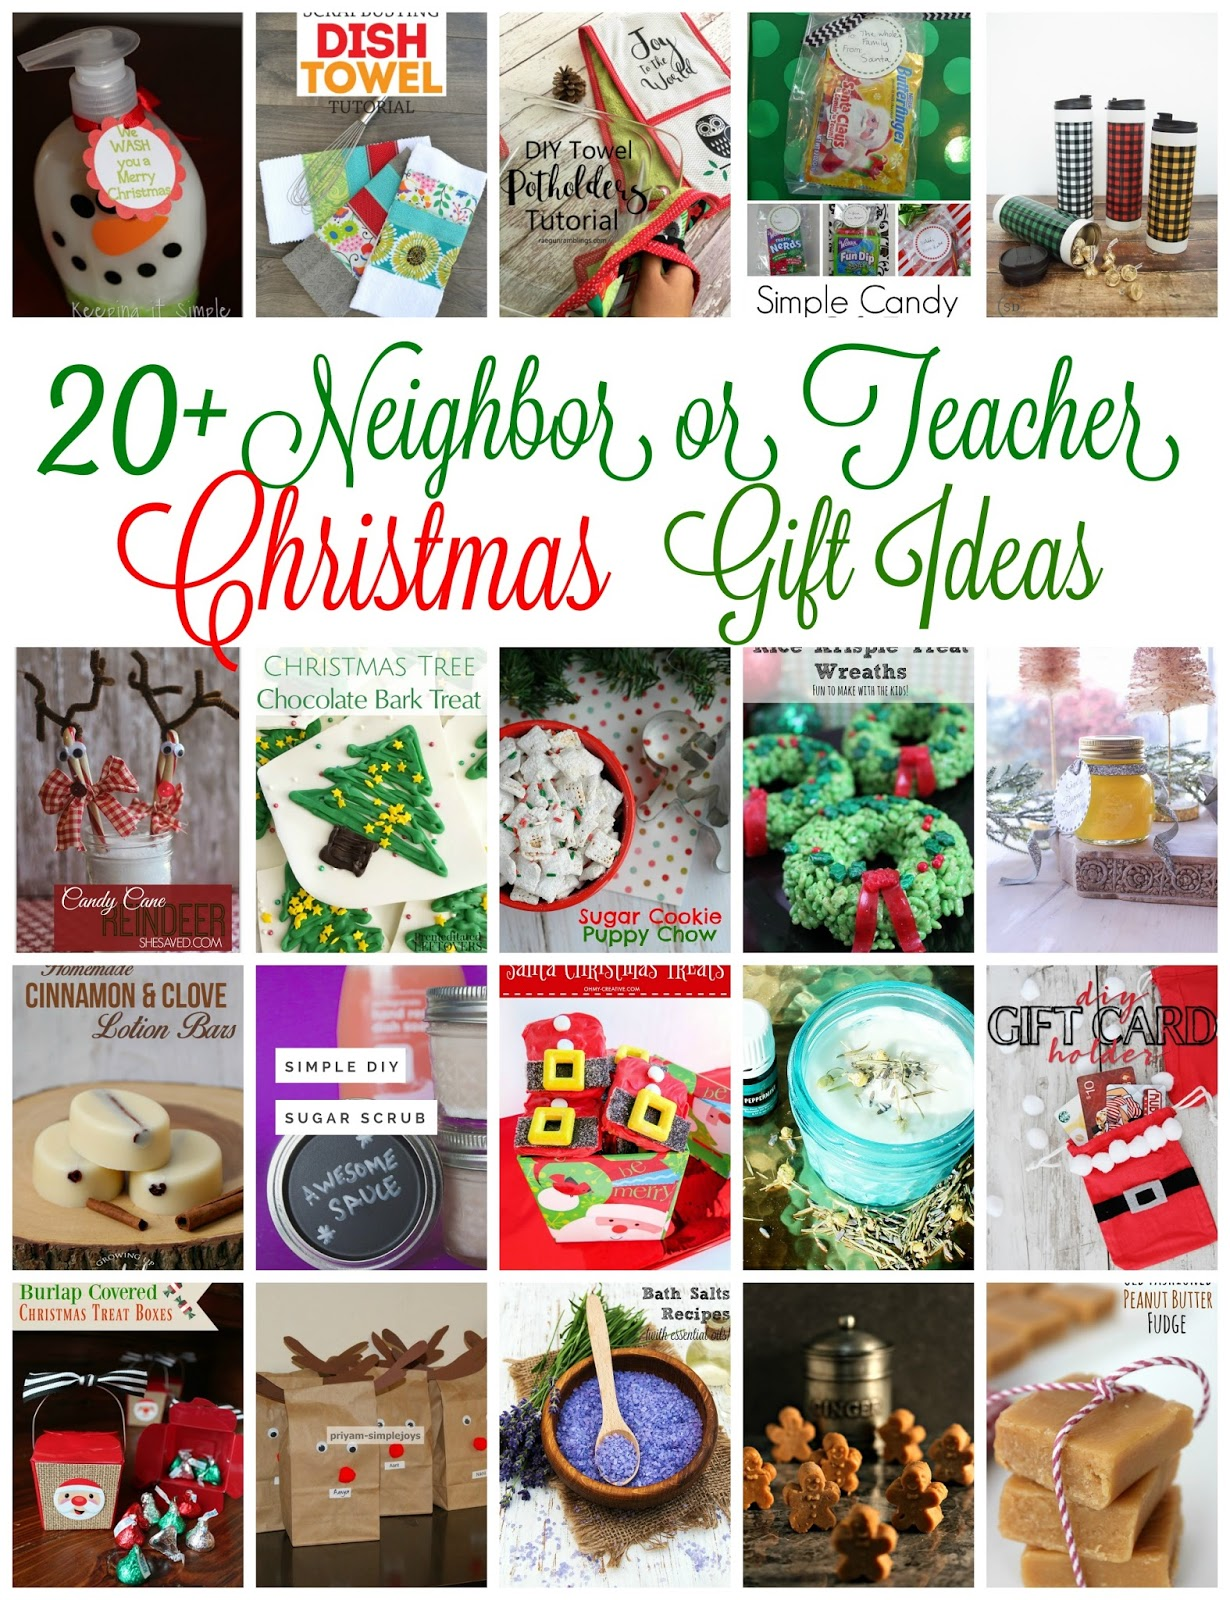 20+ Neighbor and Teacher Gift Ideas and Block Party - Rae Gun Ramblings